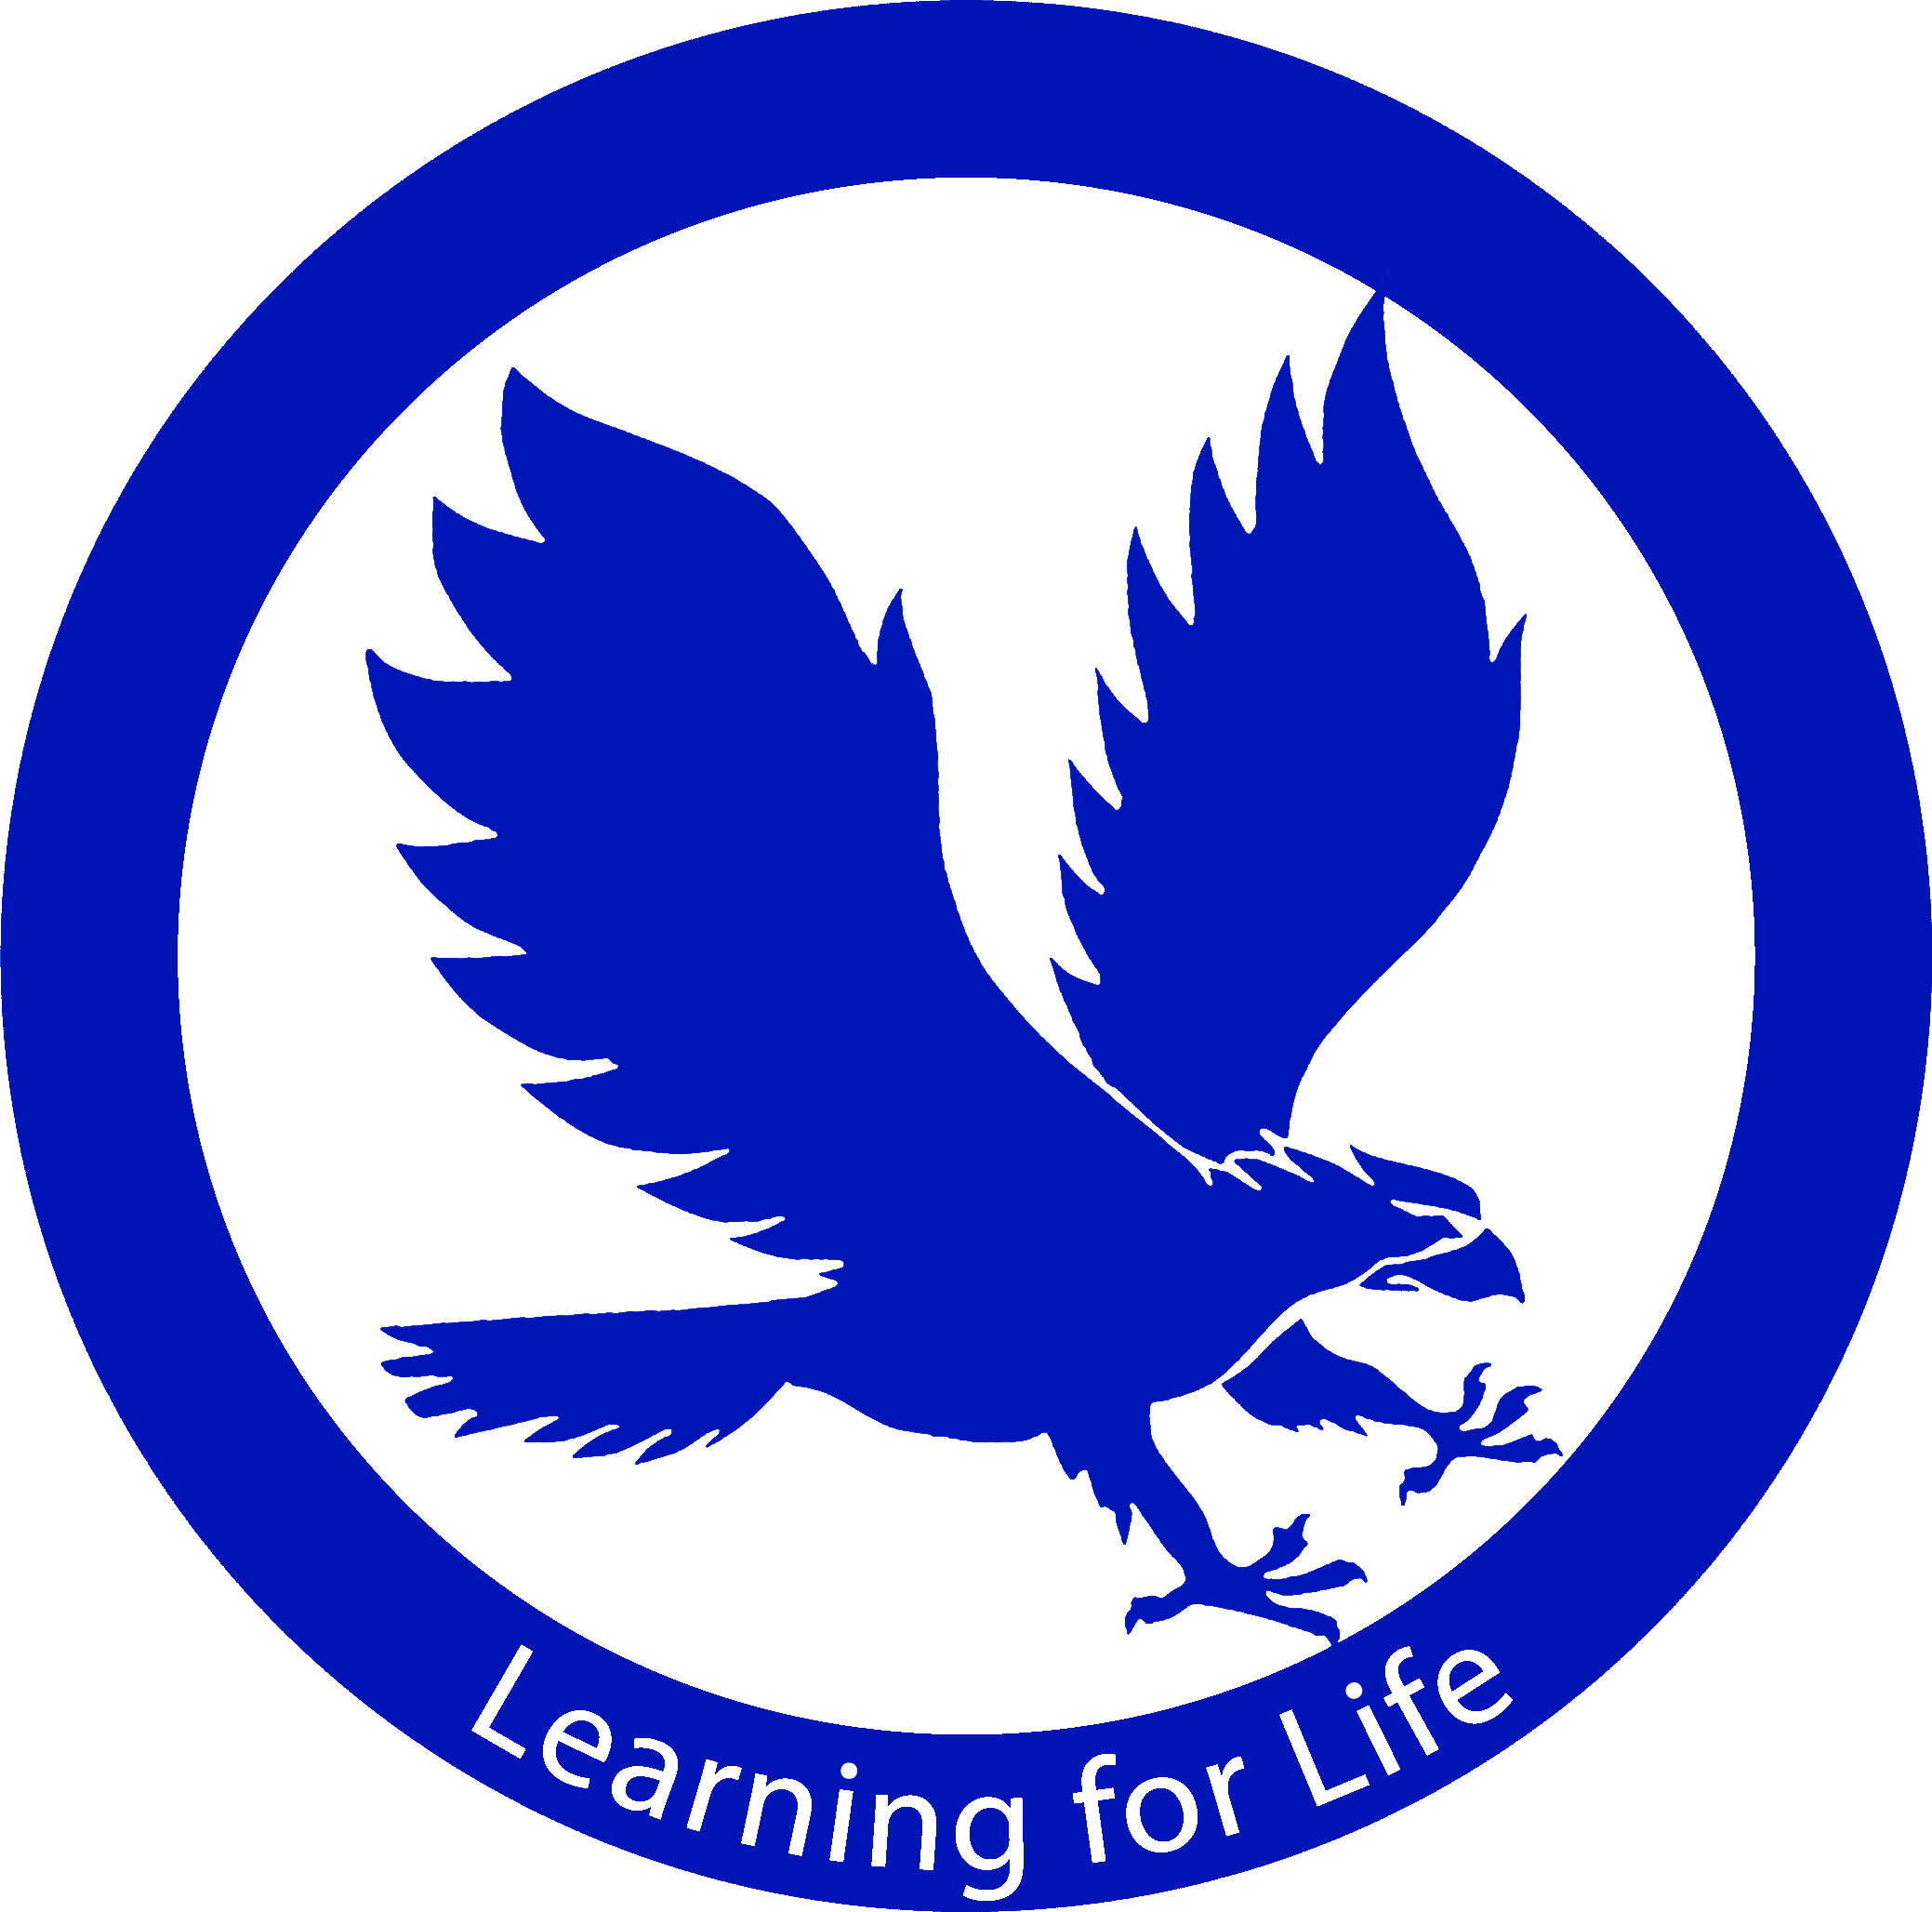 fileculcheth high school logopng wikimedia commons